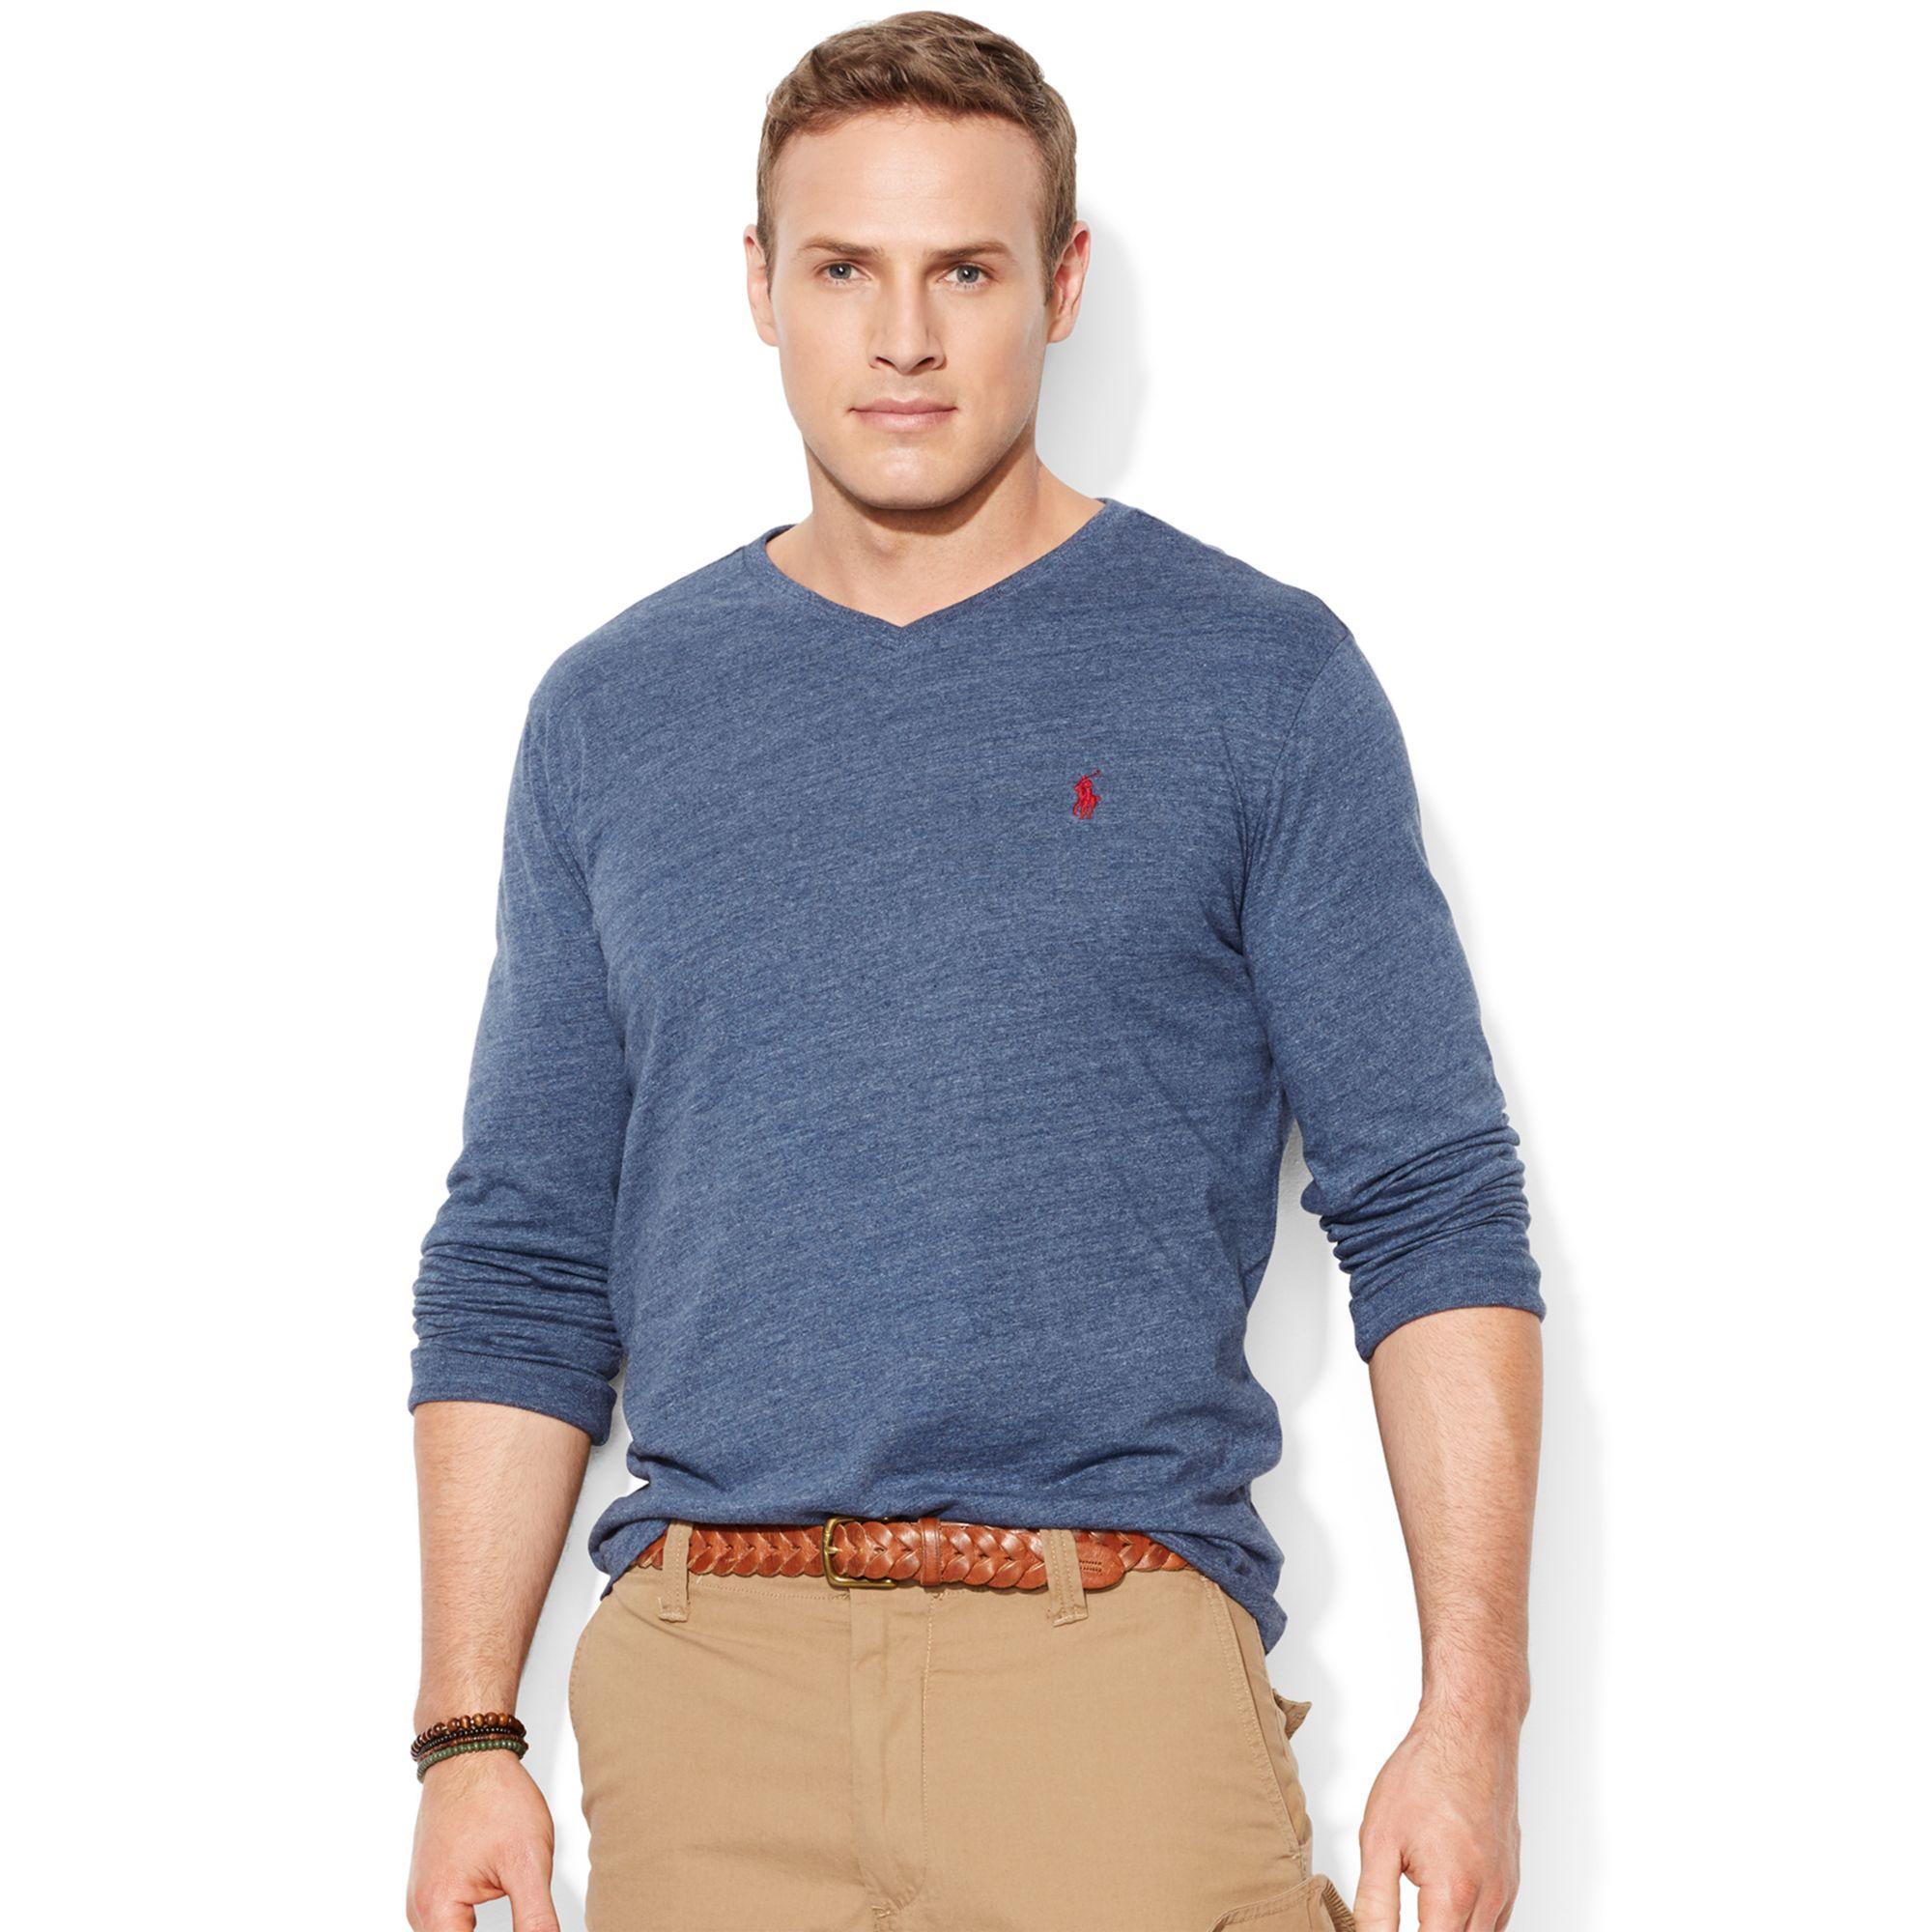 Polo ralph lauren big and tall long sleeve v neck t shirt for Tall men t shirts